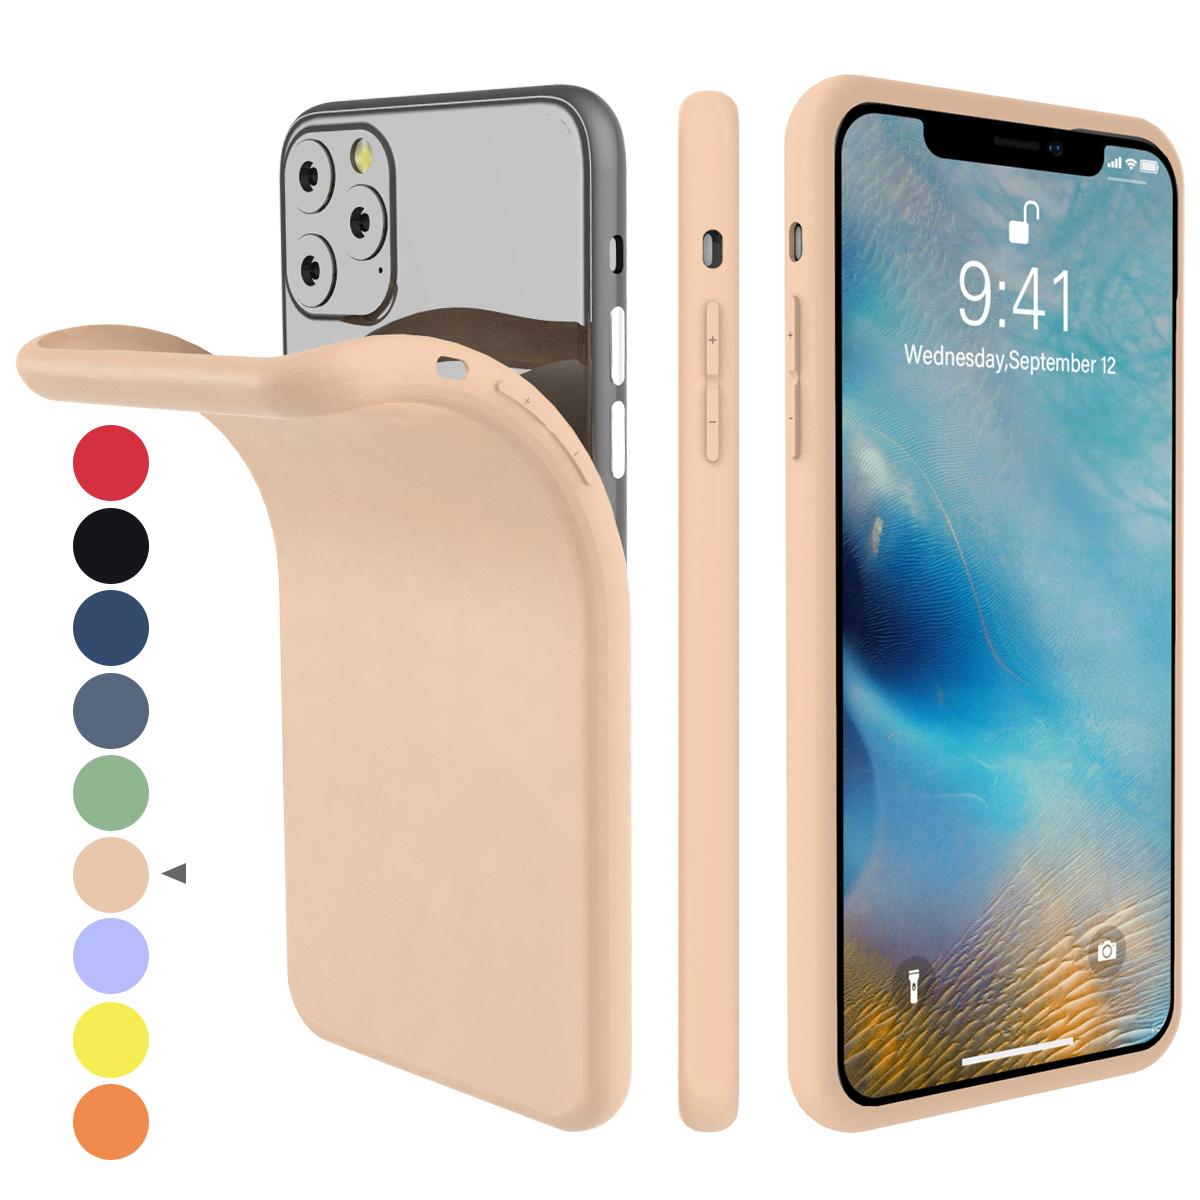 Torubia Silicone Case for iPhone 11/11 Pro/11 Pro Max 109